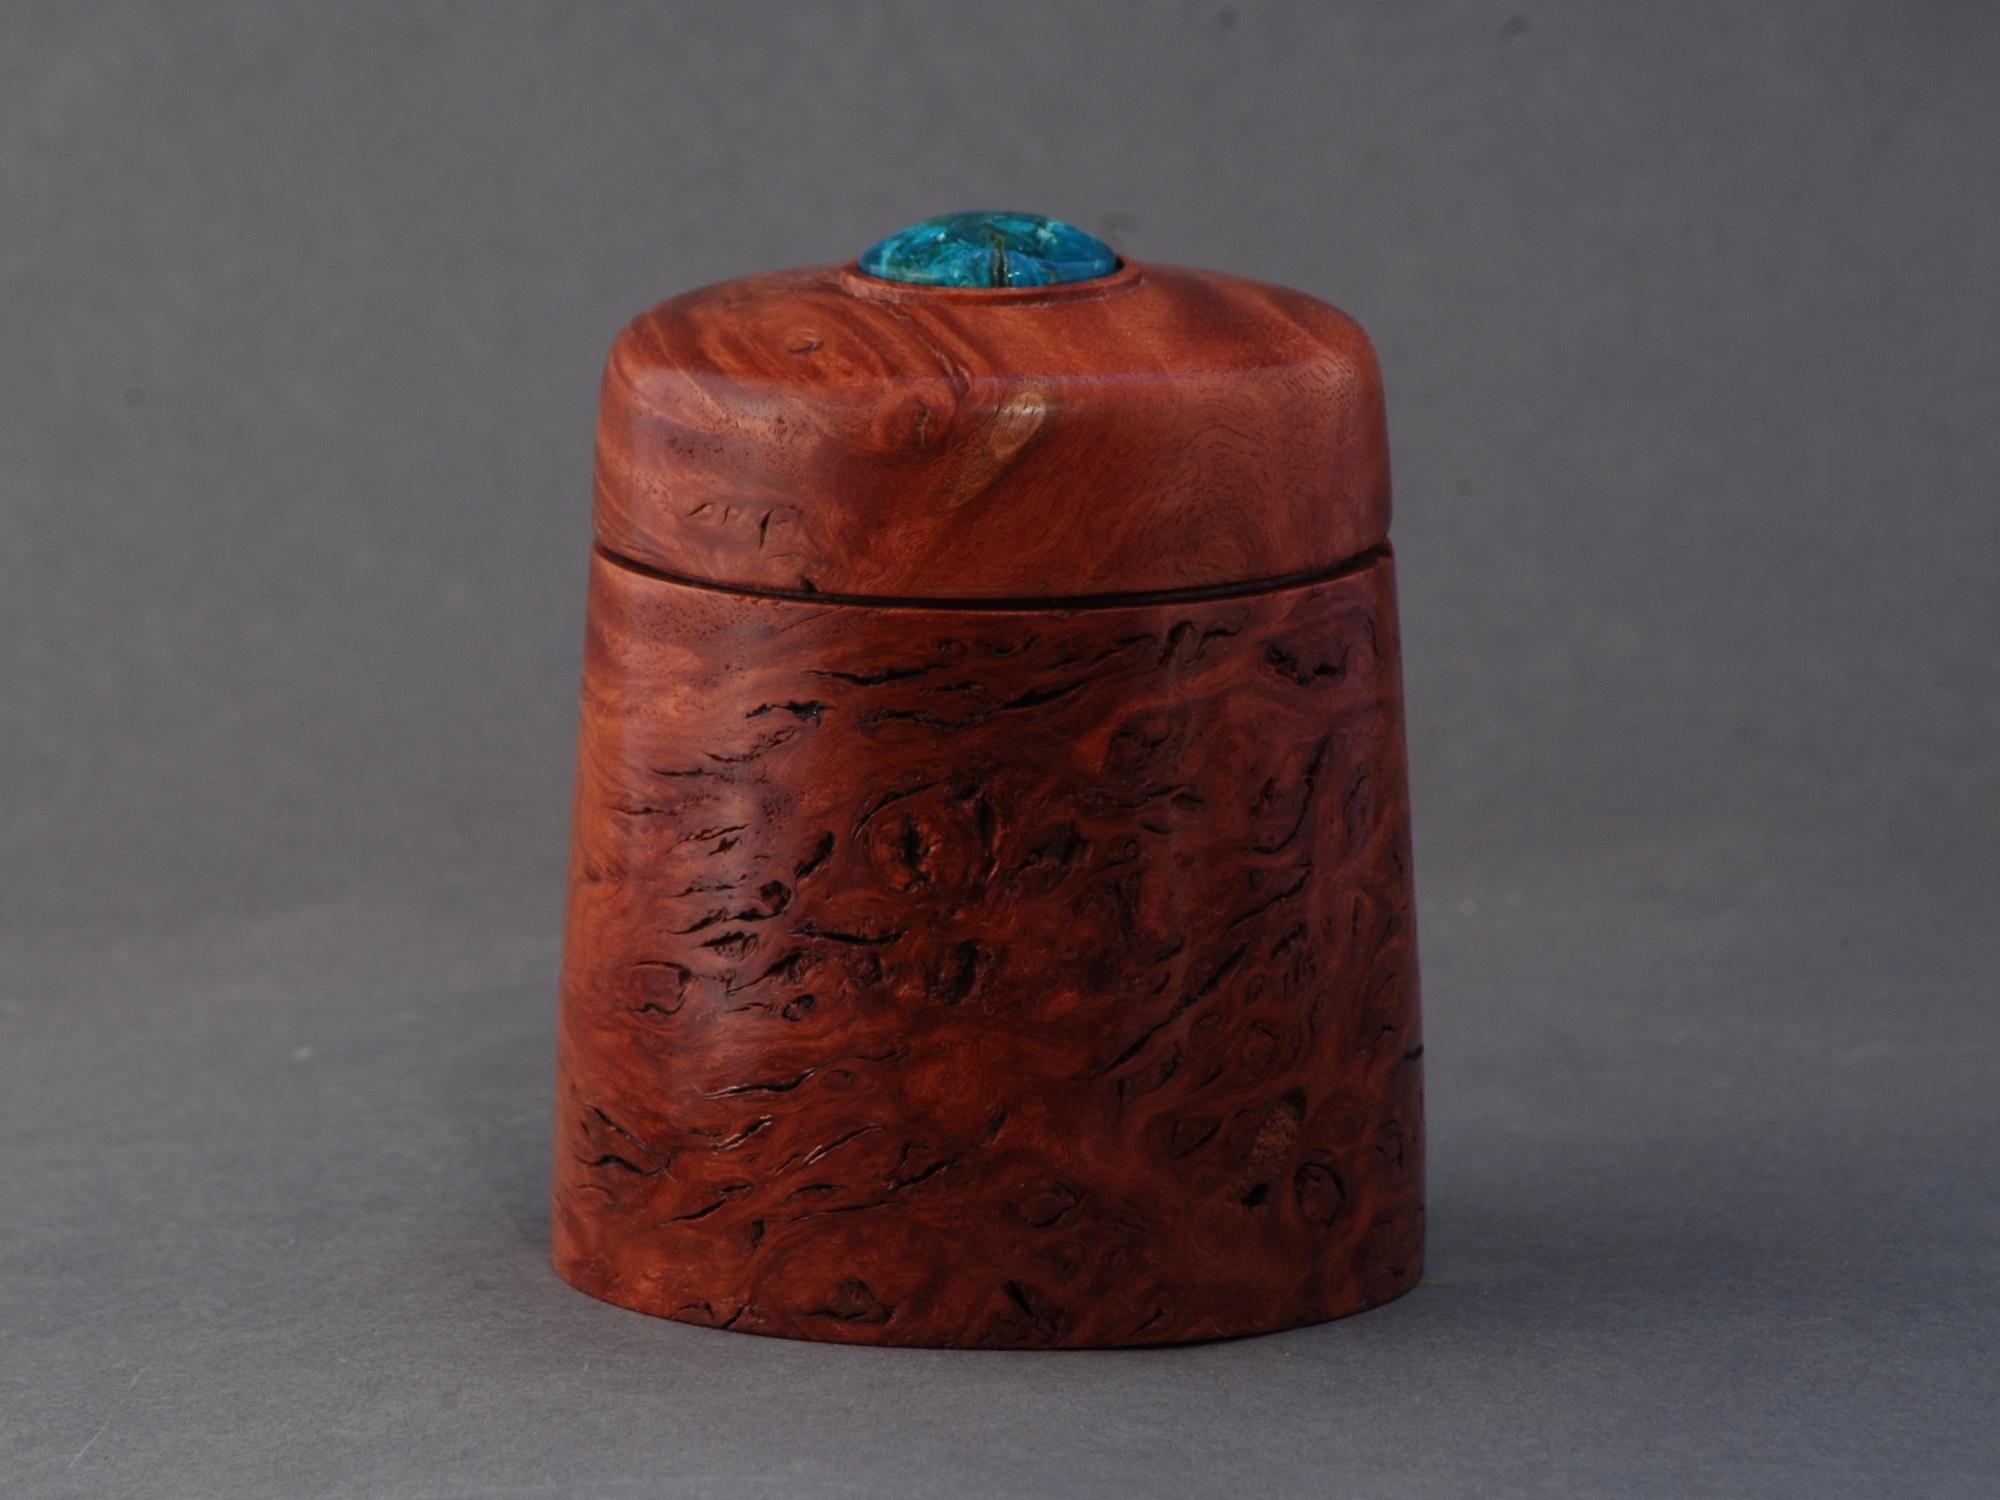 Jarrah Burl and Chrysocolla Box - $120